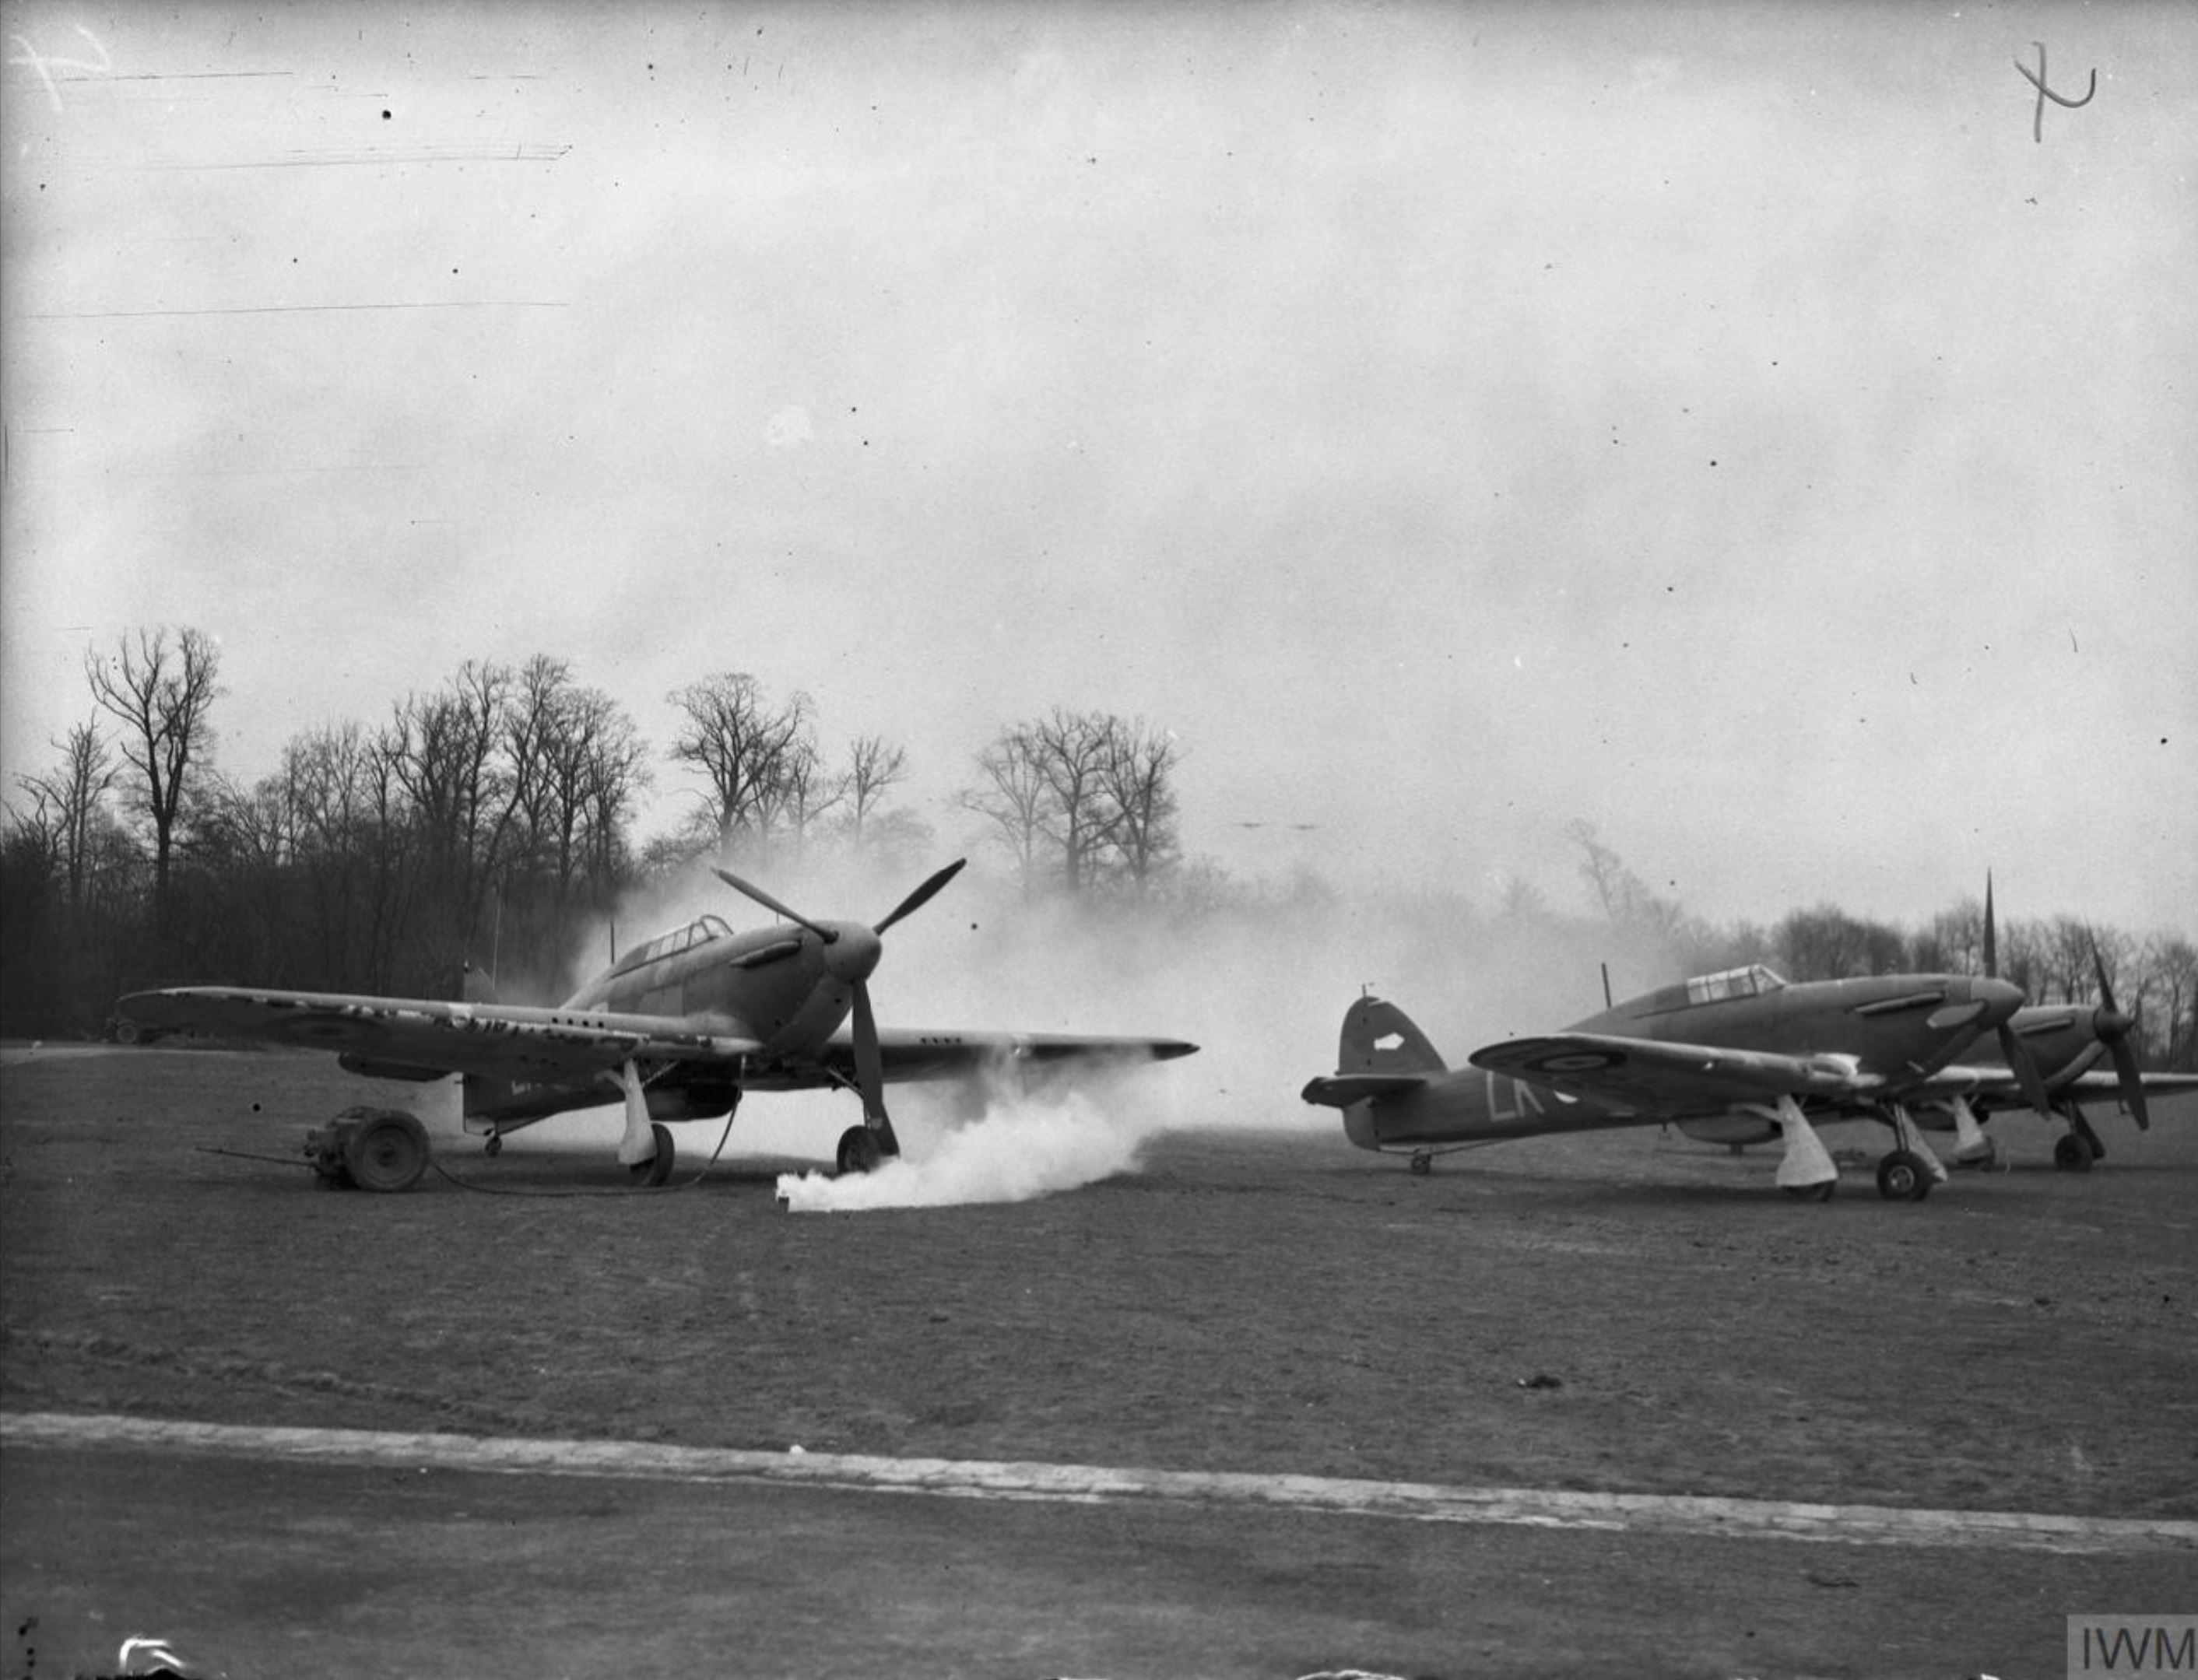 Hurricane I RAF 87Sqn simulating a attack Lille Seclin France Mar 1940 IWM C1152